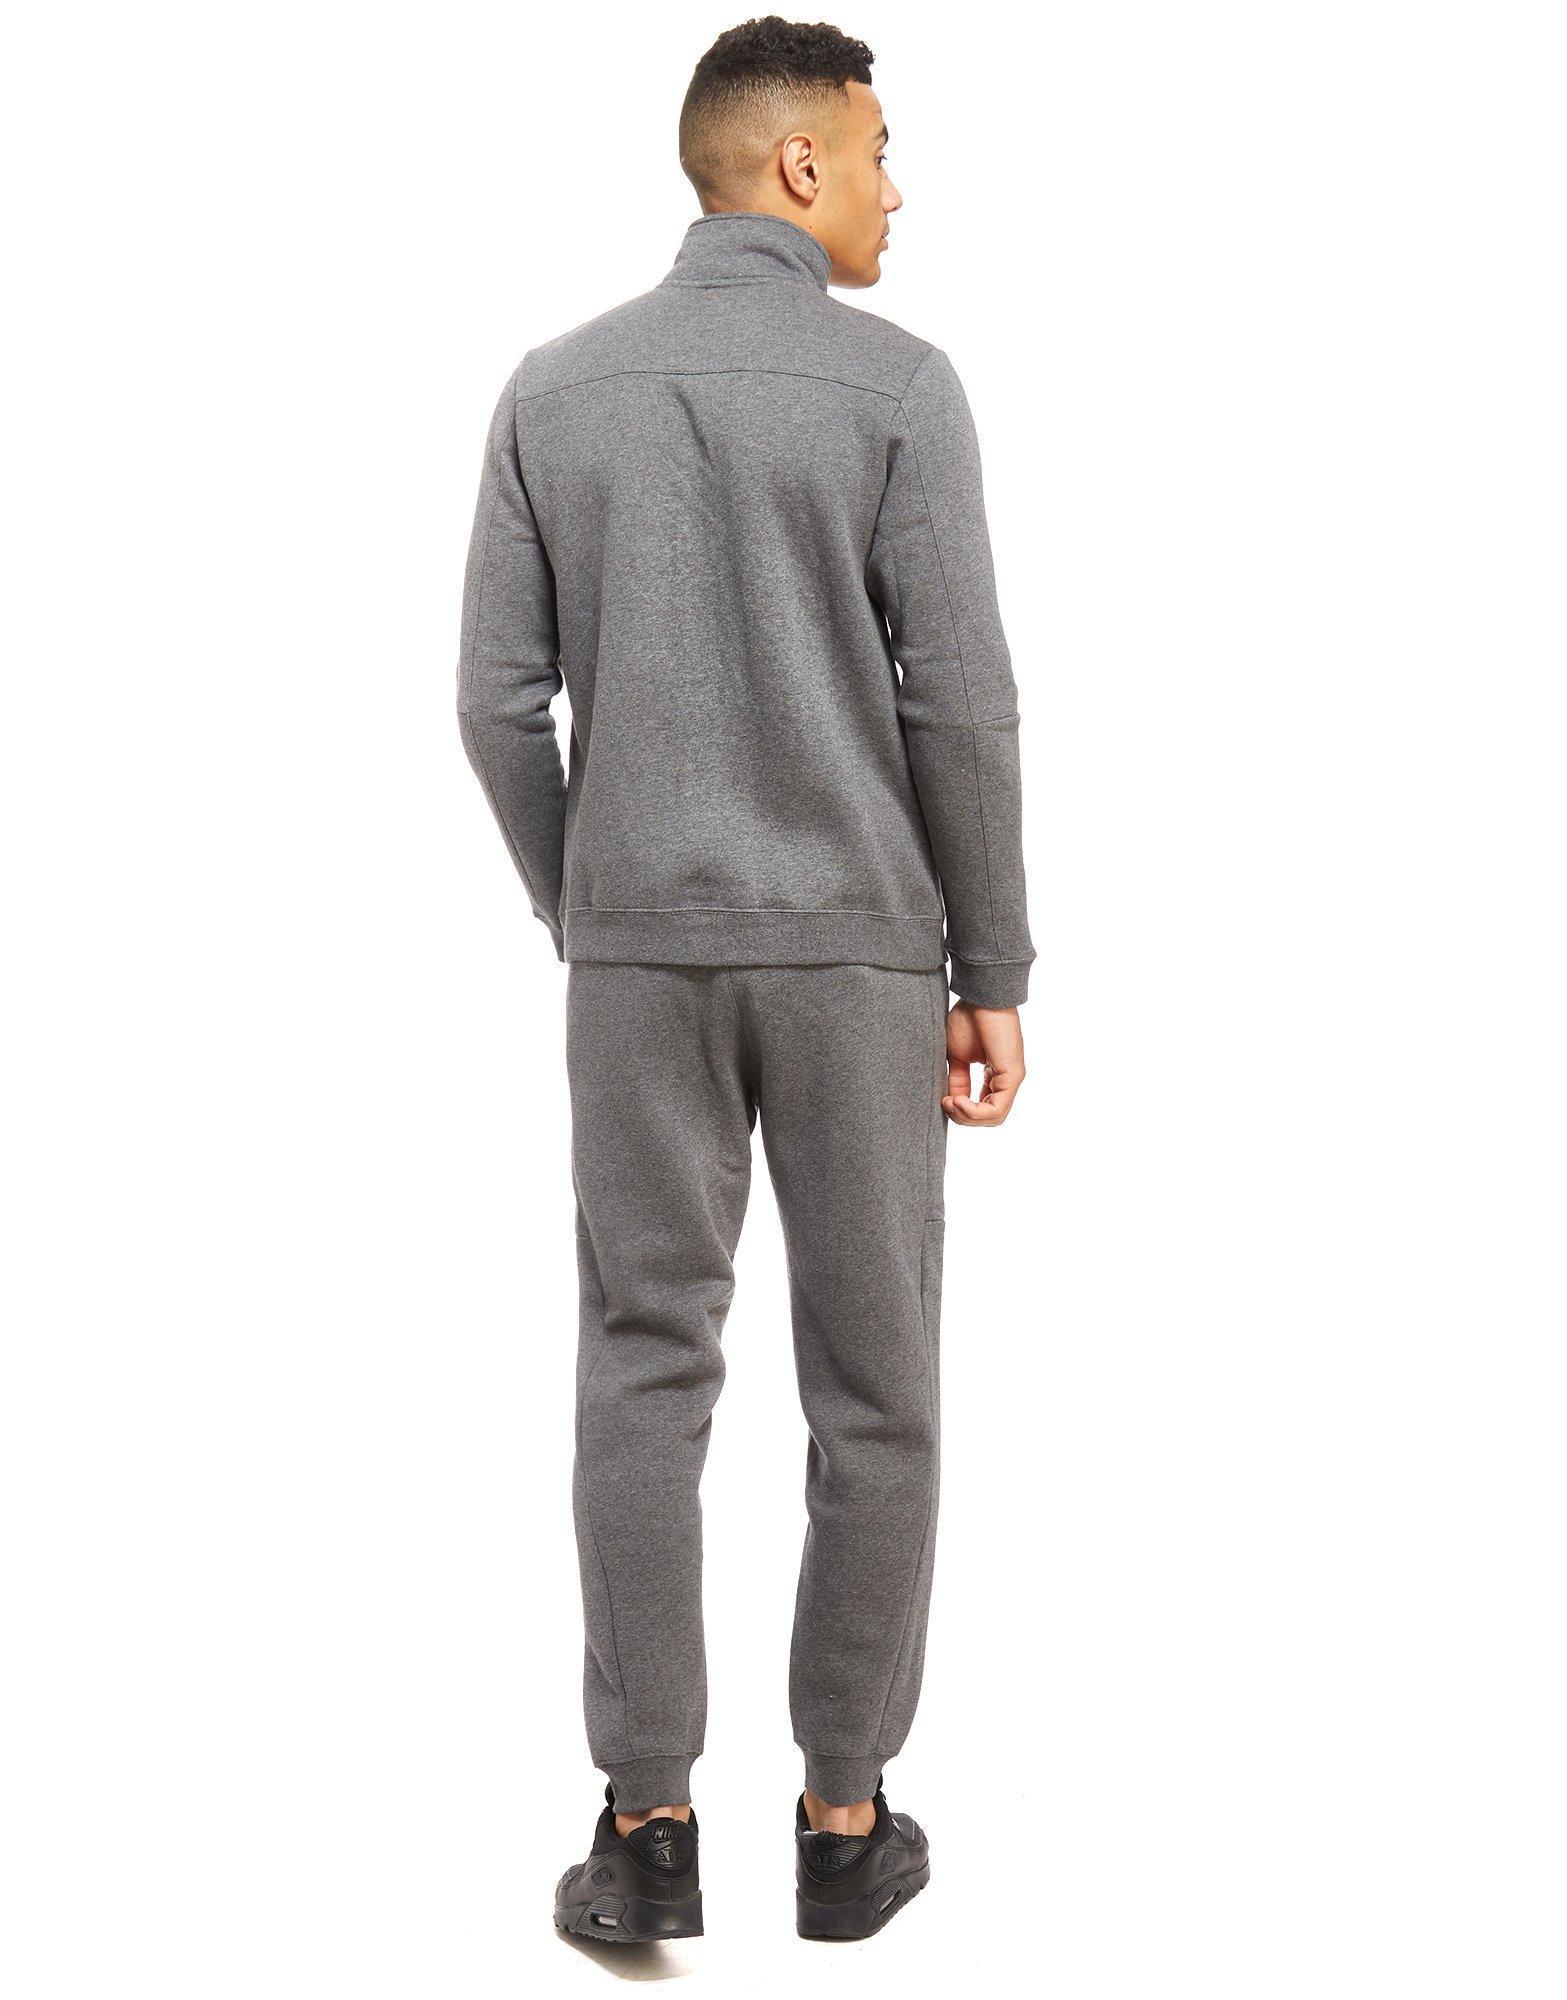 30cd160b40 ... lowest price 808d9 01745 Nike Season 2 Tracksuit in Gray for Men - Lyst  ...